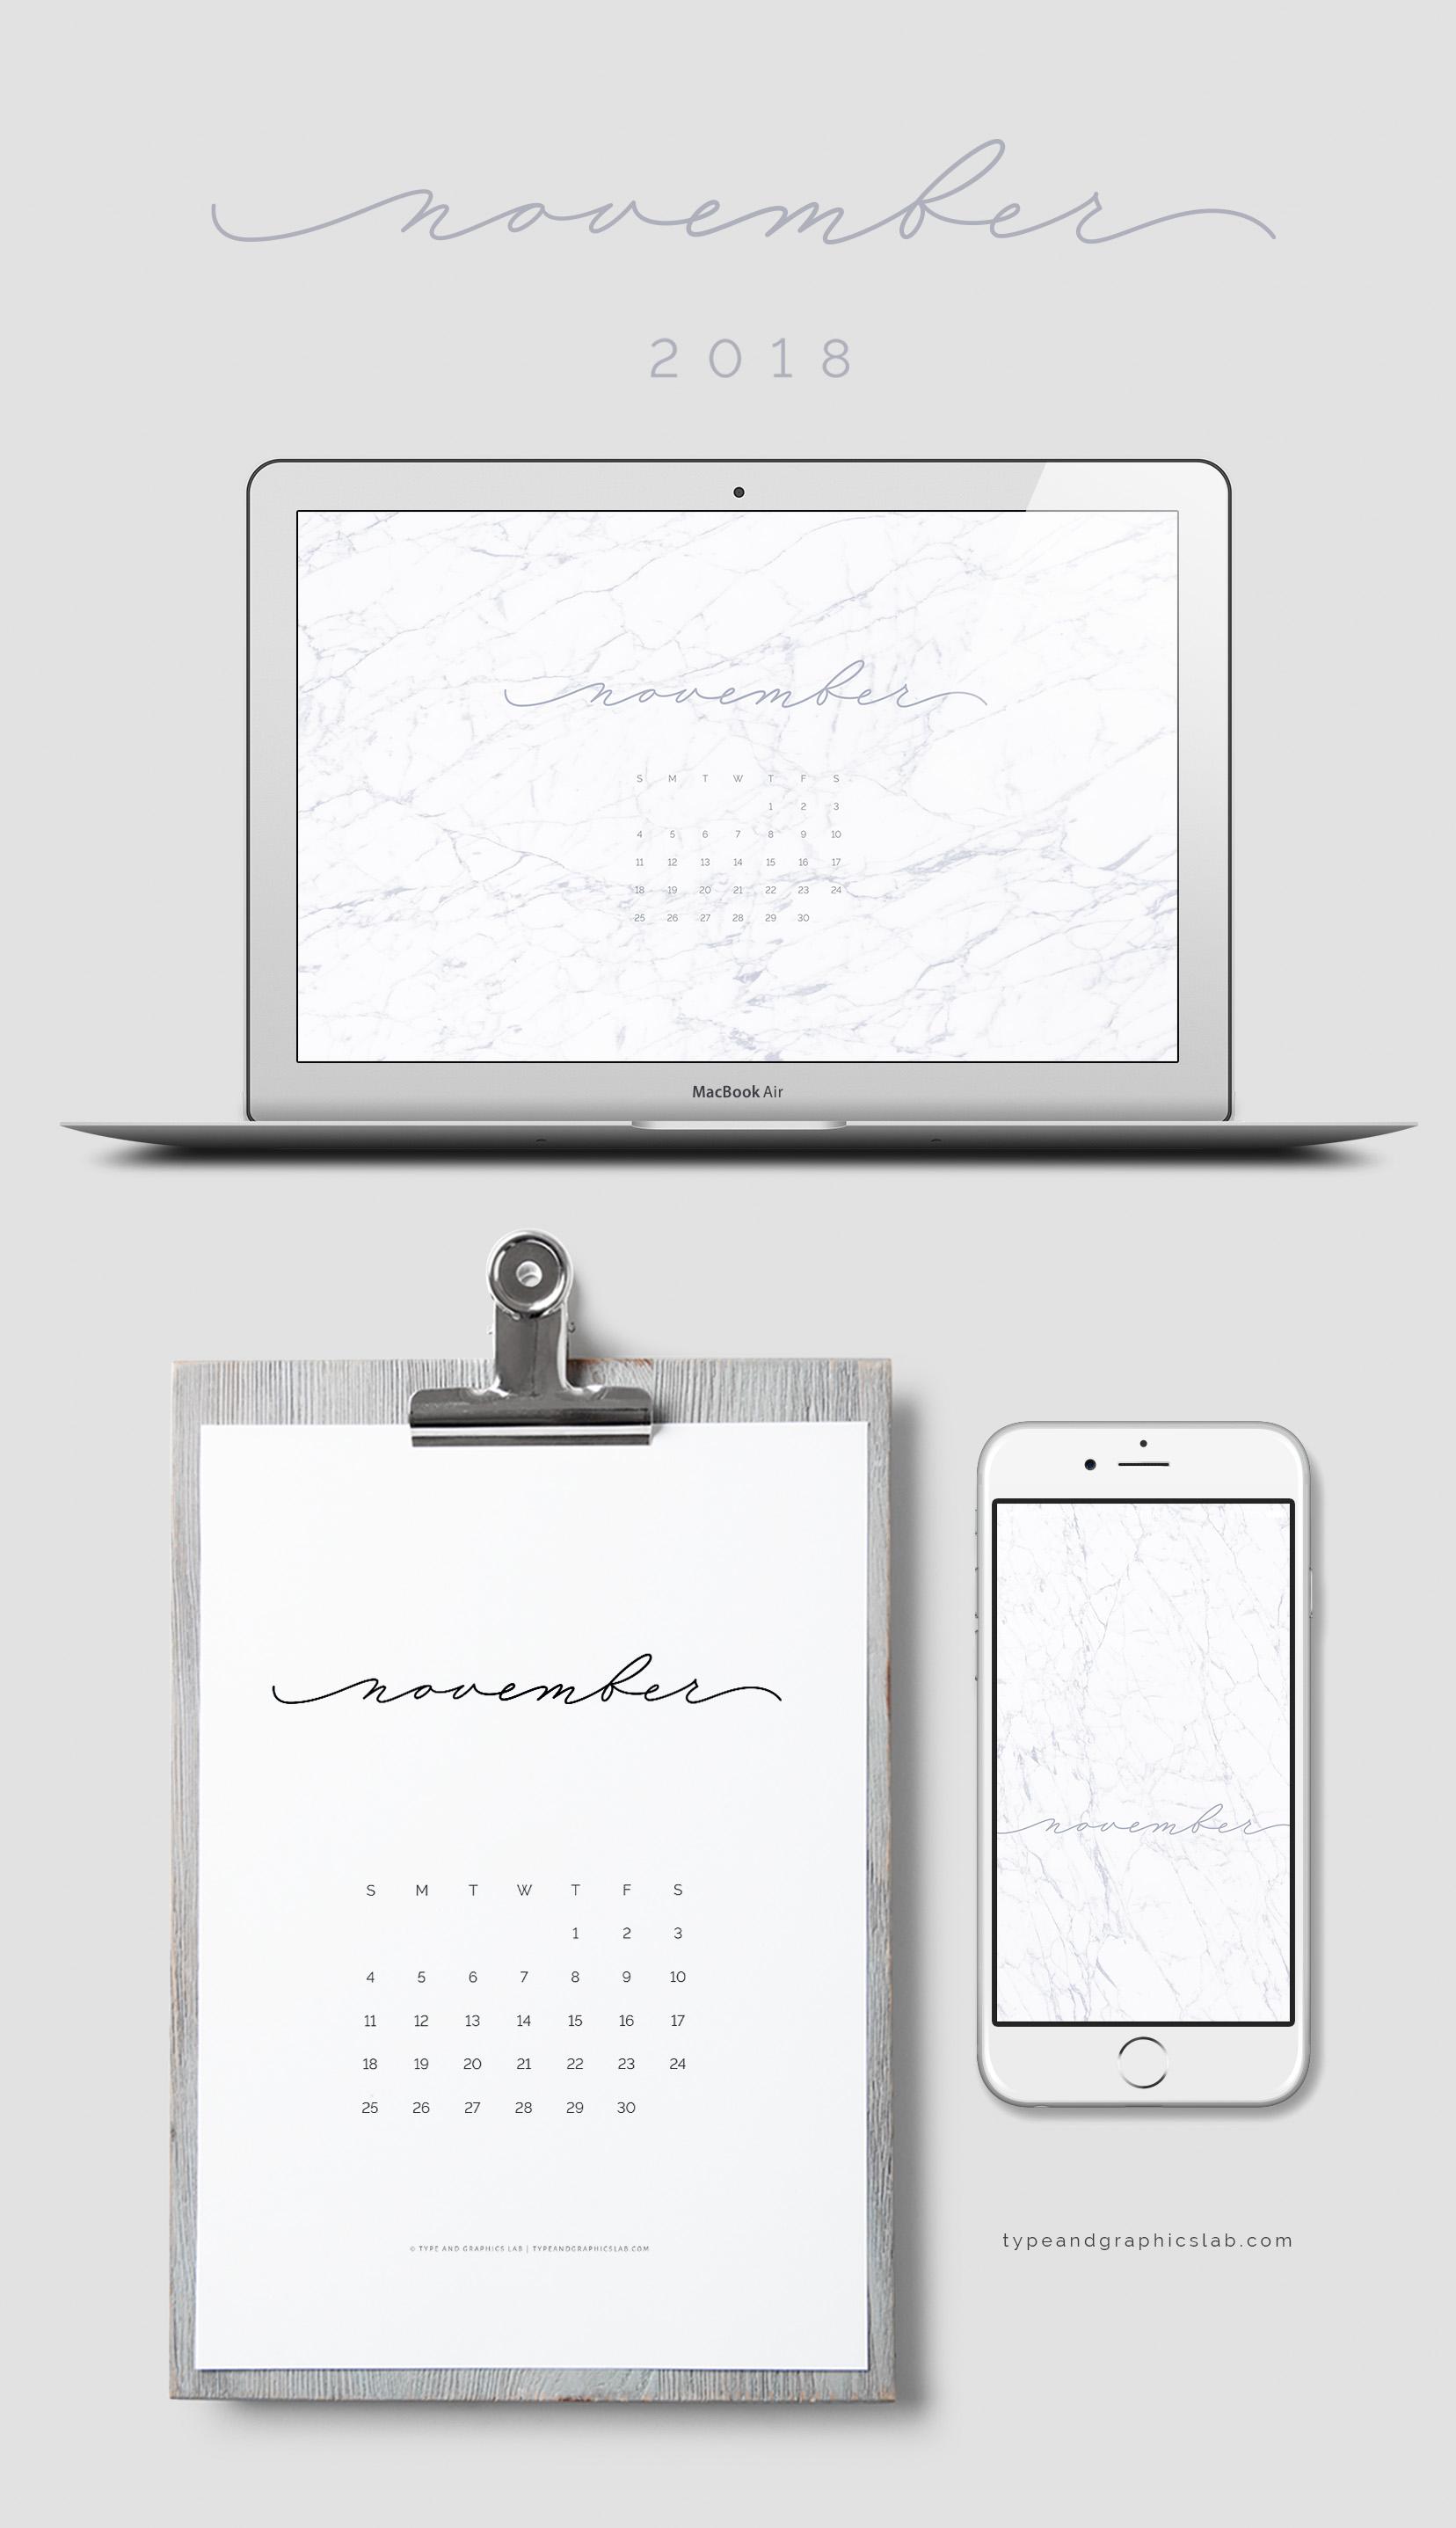 Download free desktop, mobile, and printable calendar for November 2018 |©typeandgraphicslab.com | For personal use only